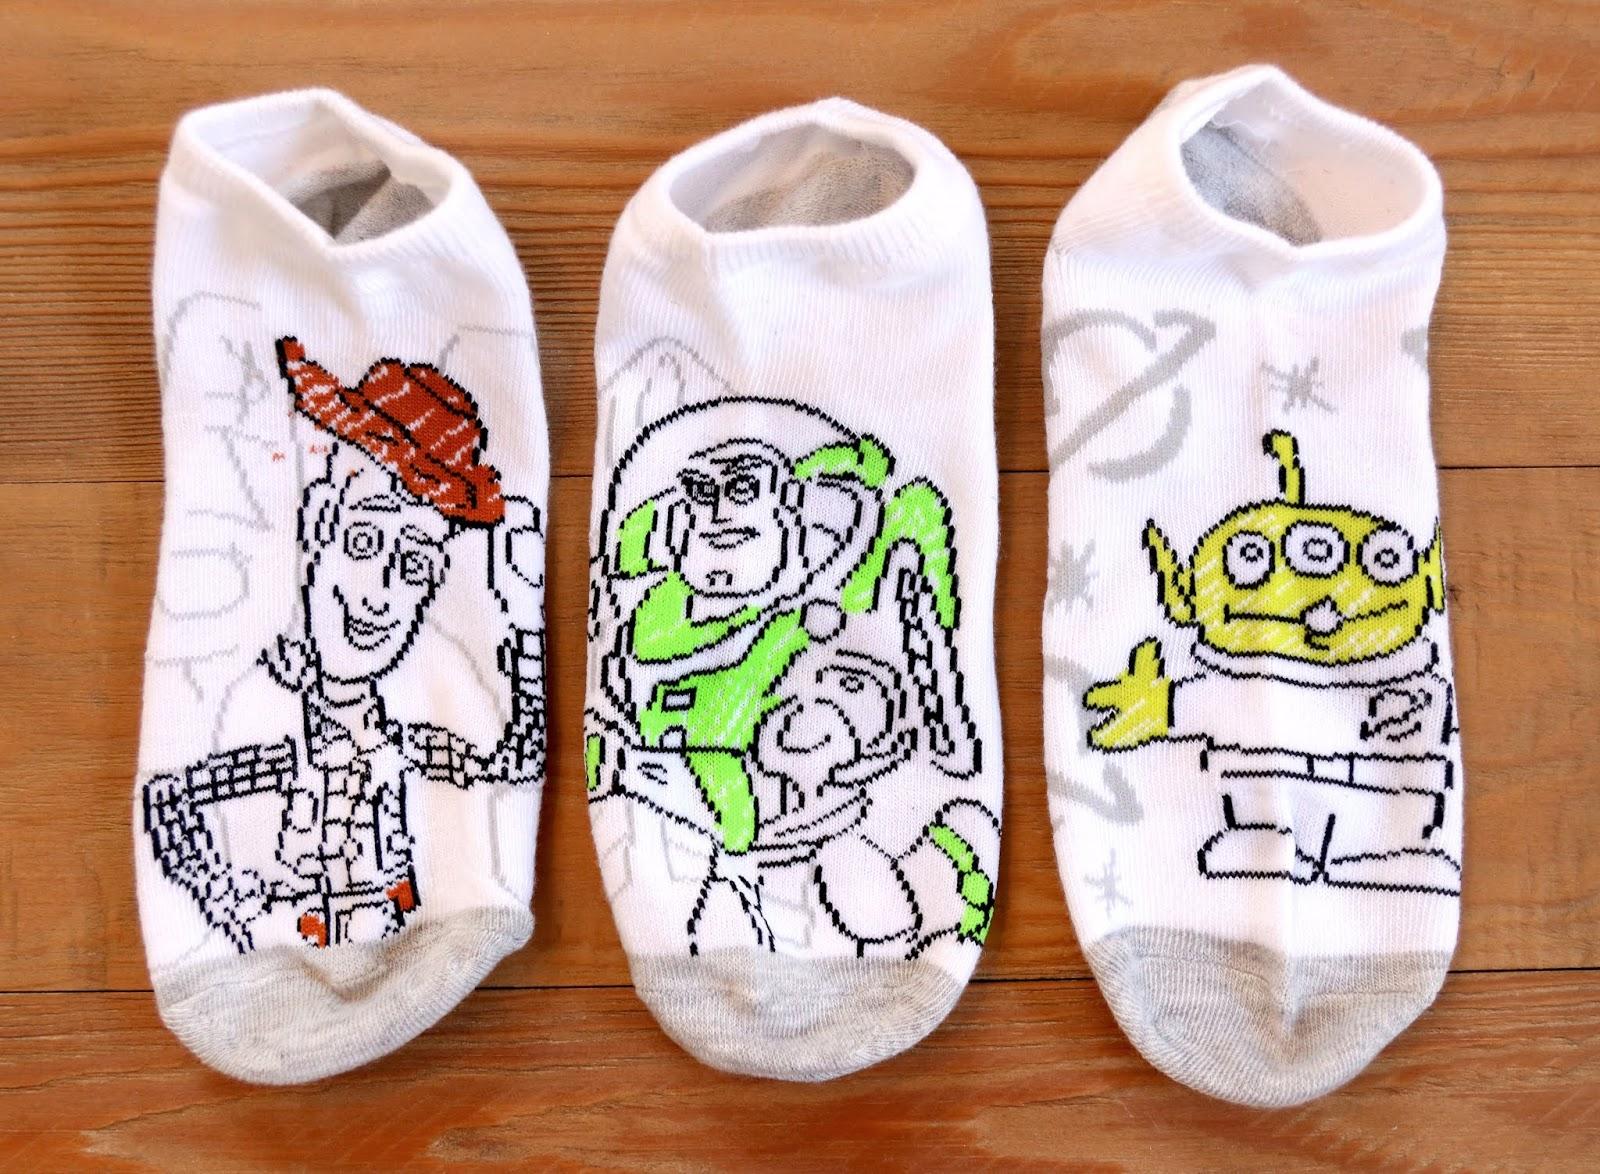 pixar characters socks